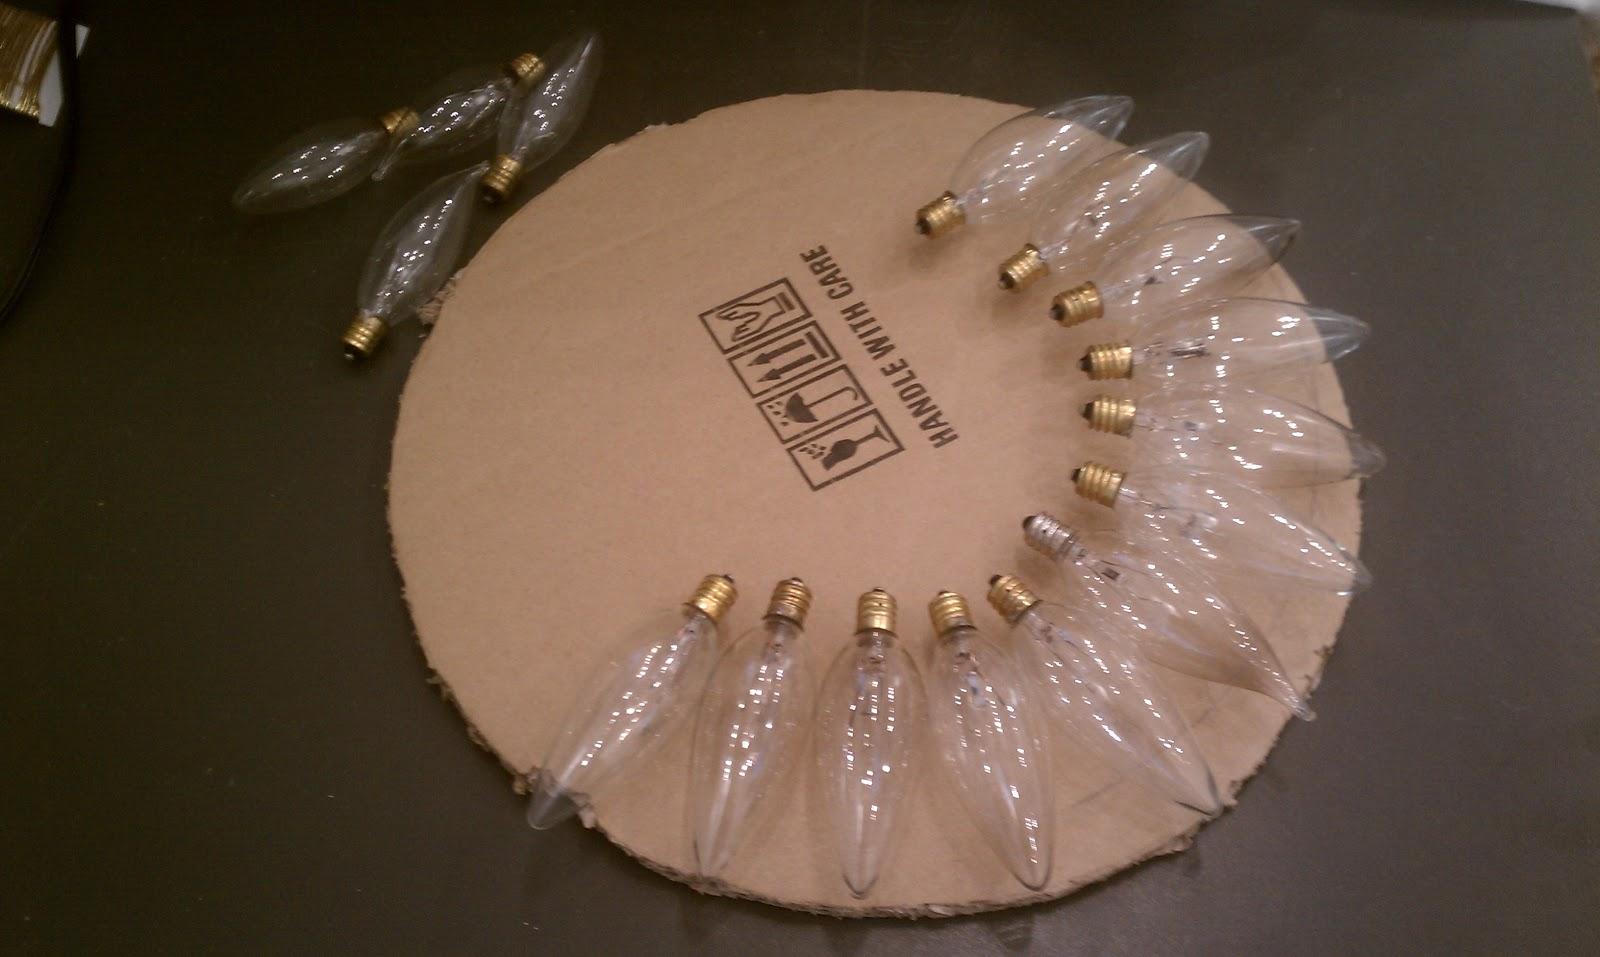 Nadia 39 s diy projects diy light bulb wreath and tree for Light bulb diy projects